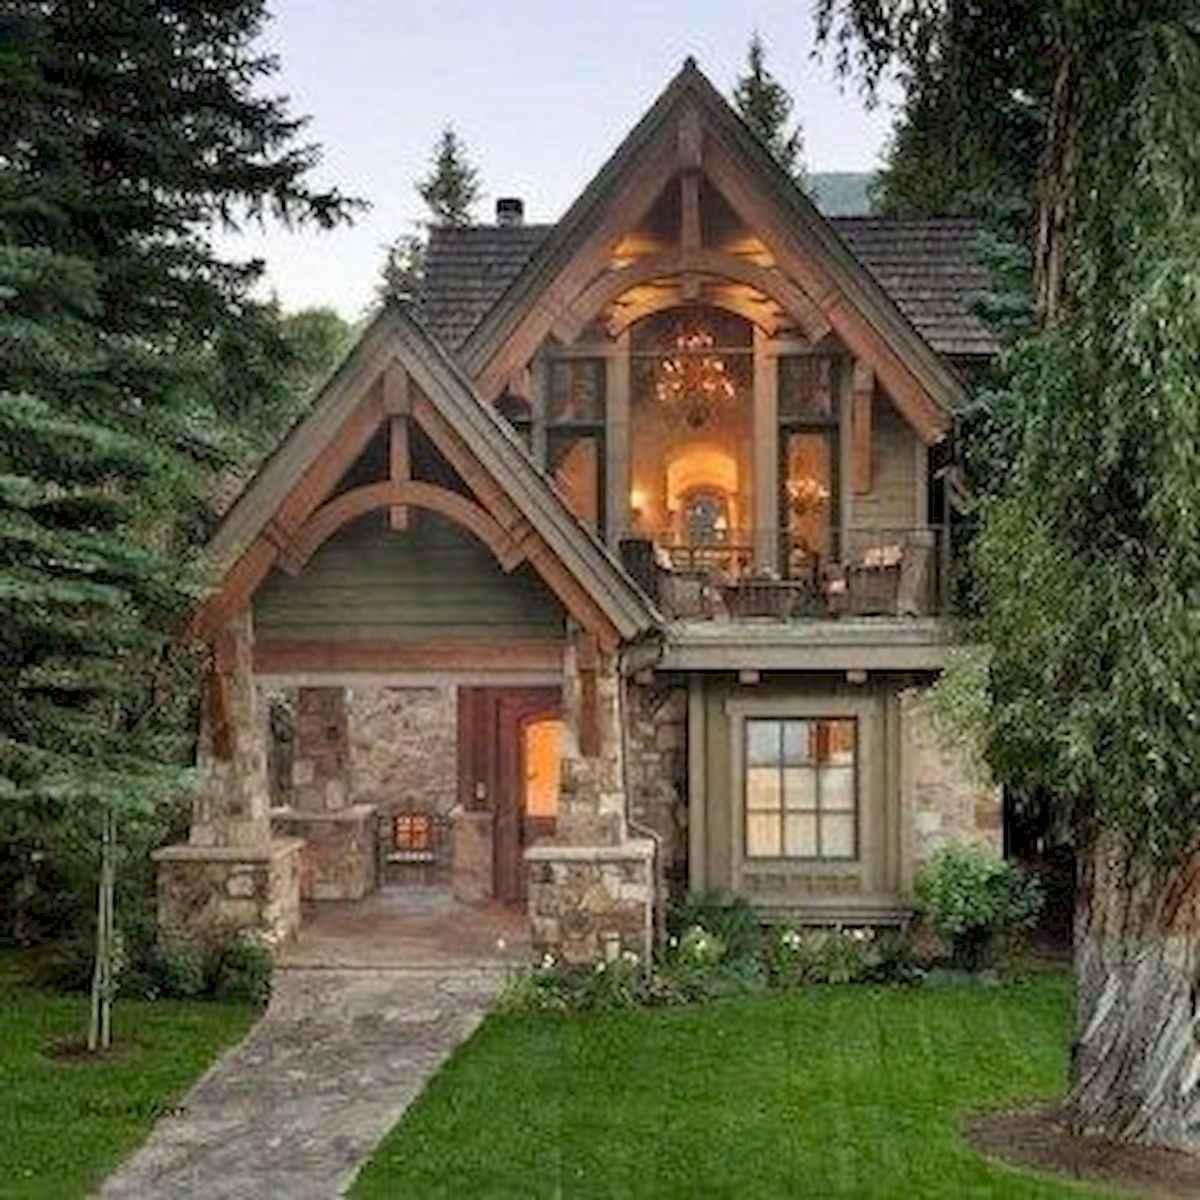 75 Great Log Cabin Homes Plans Design Ideas (28)